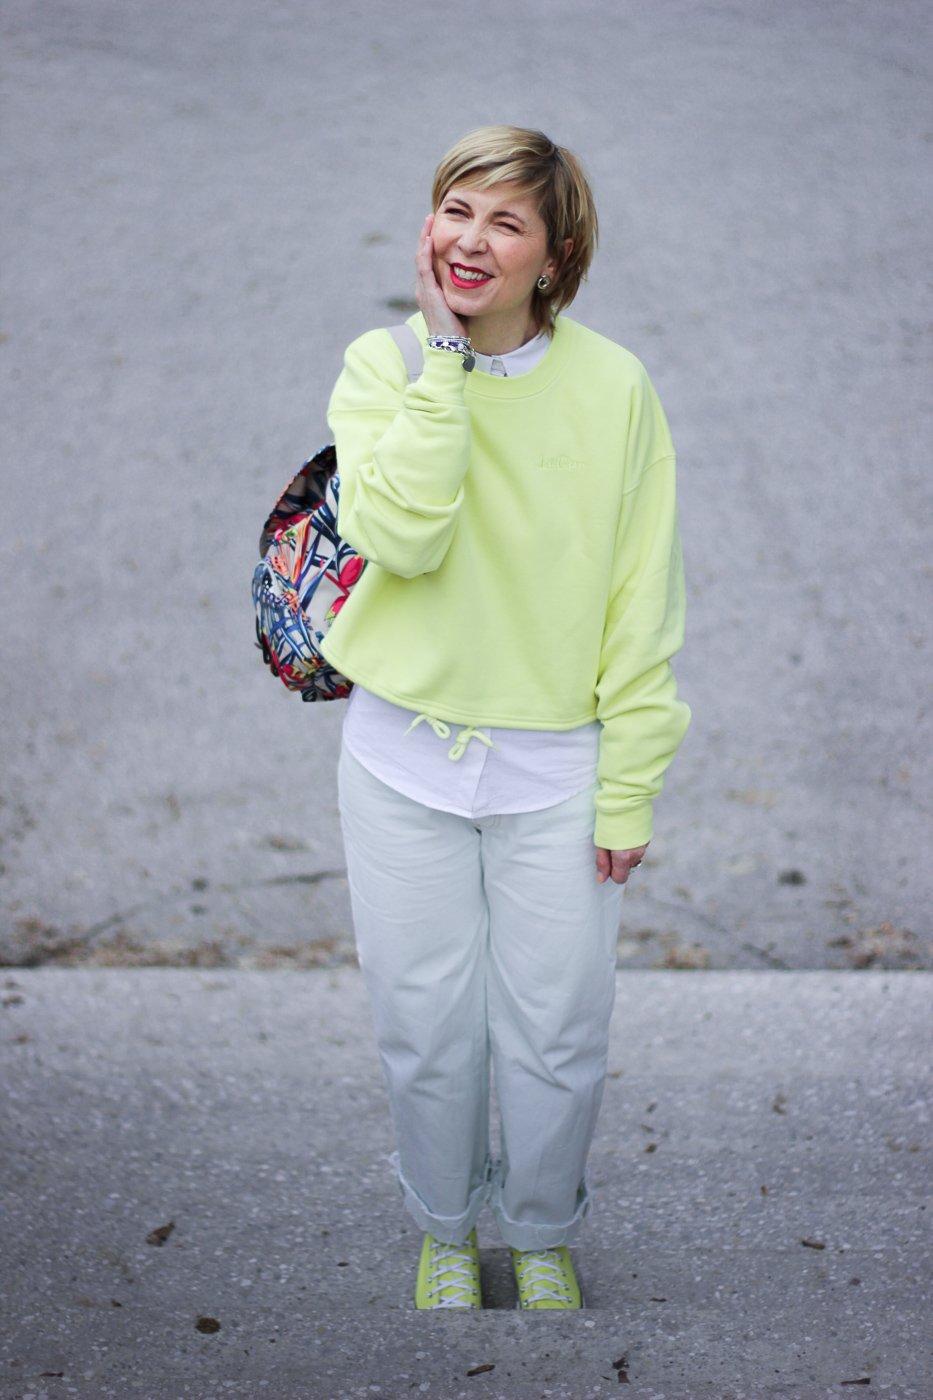 conny doll lifestyle: Frühlingslook in Gelb, Chucks, weiße Jeans, Lagenlook